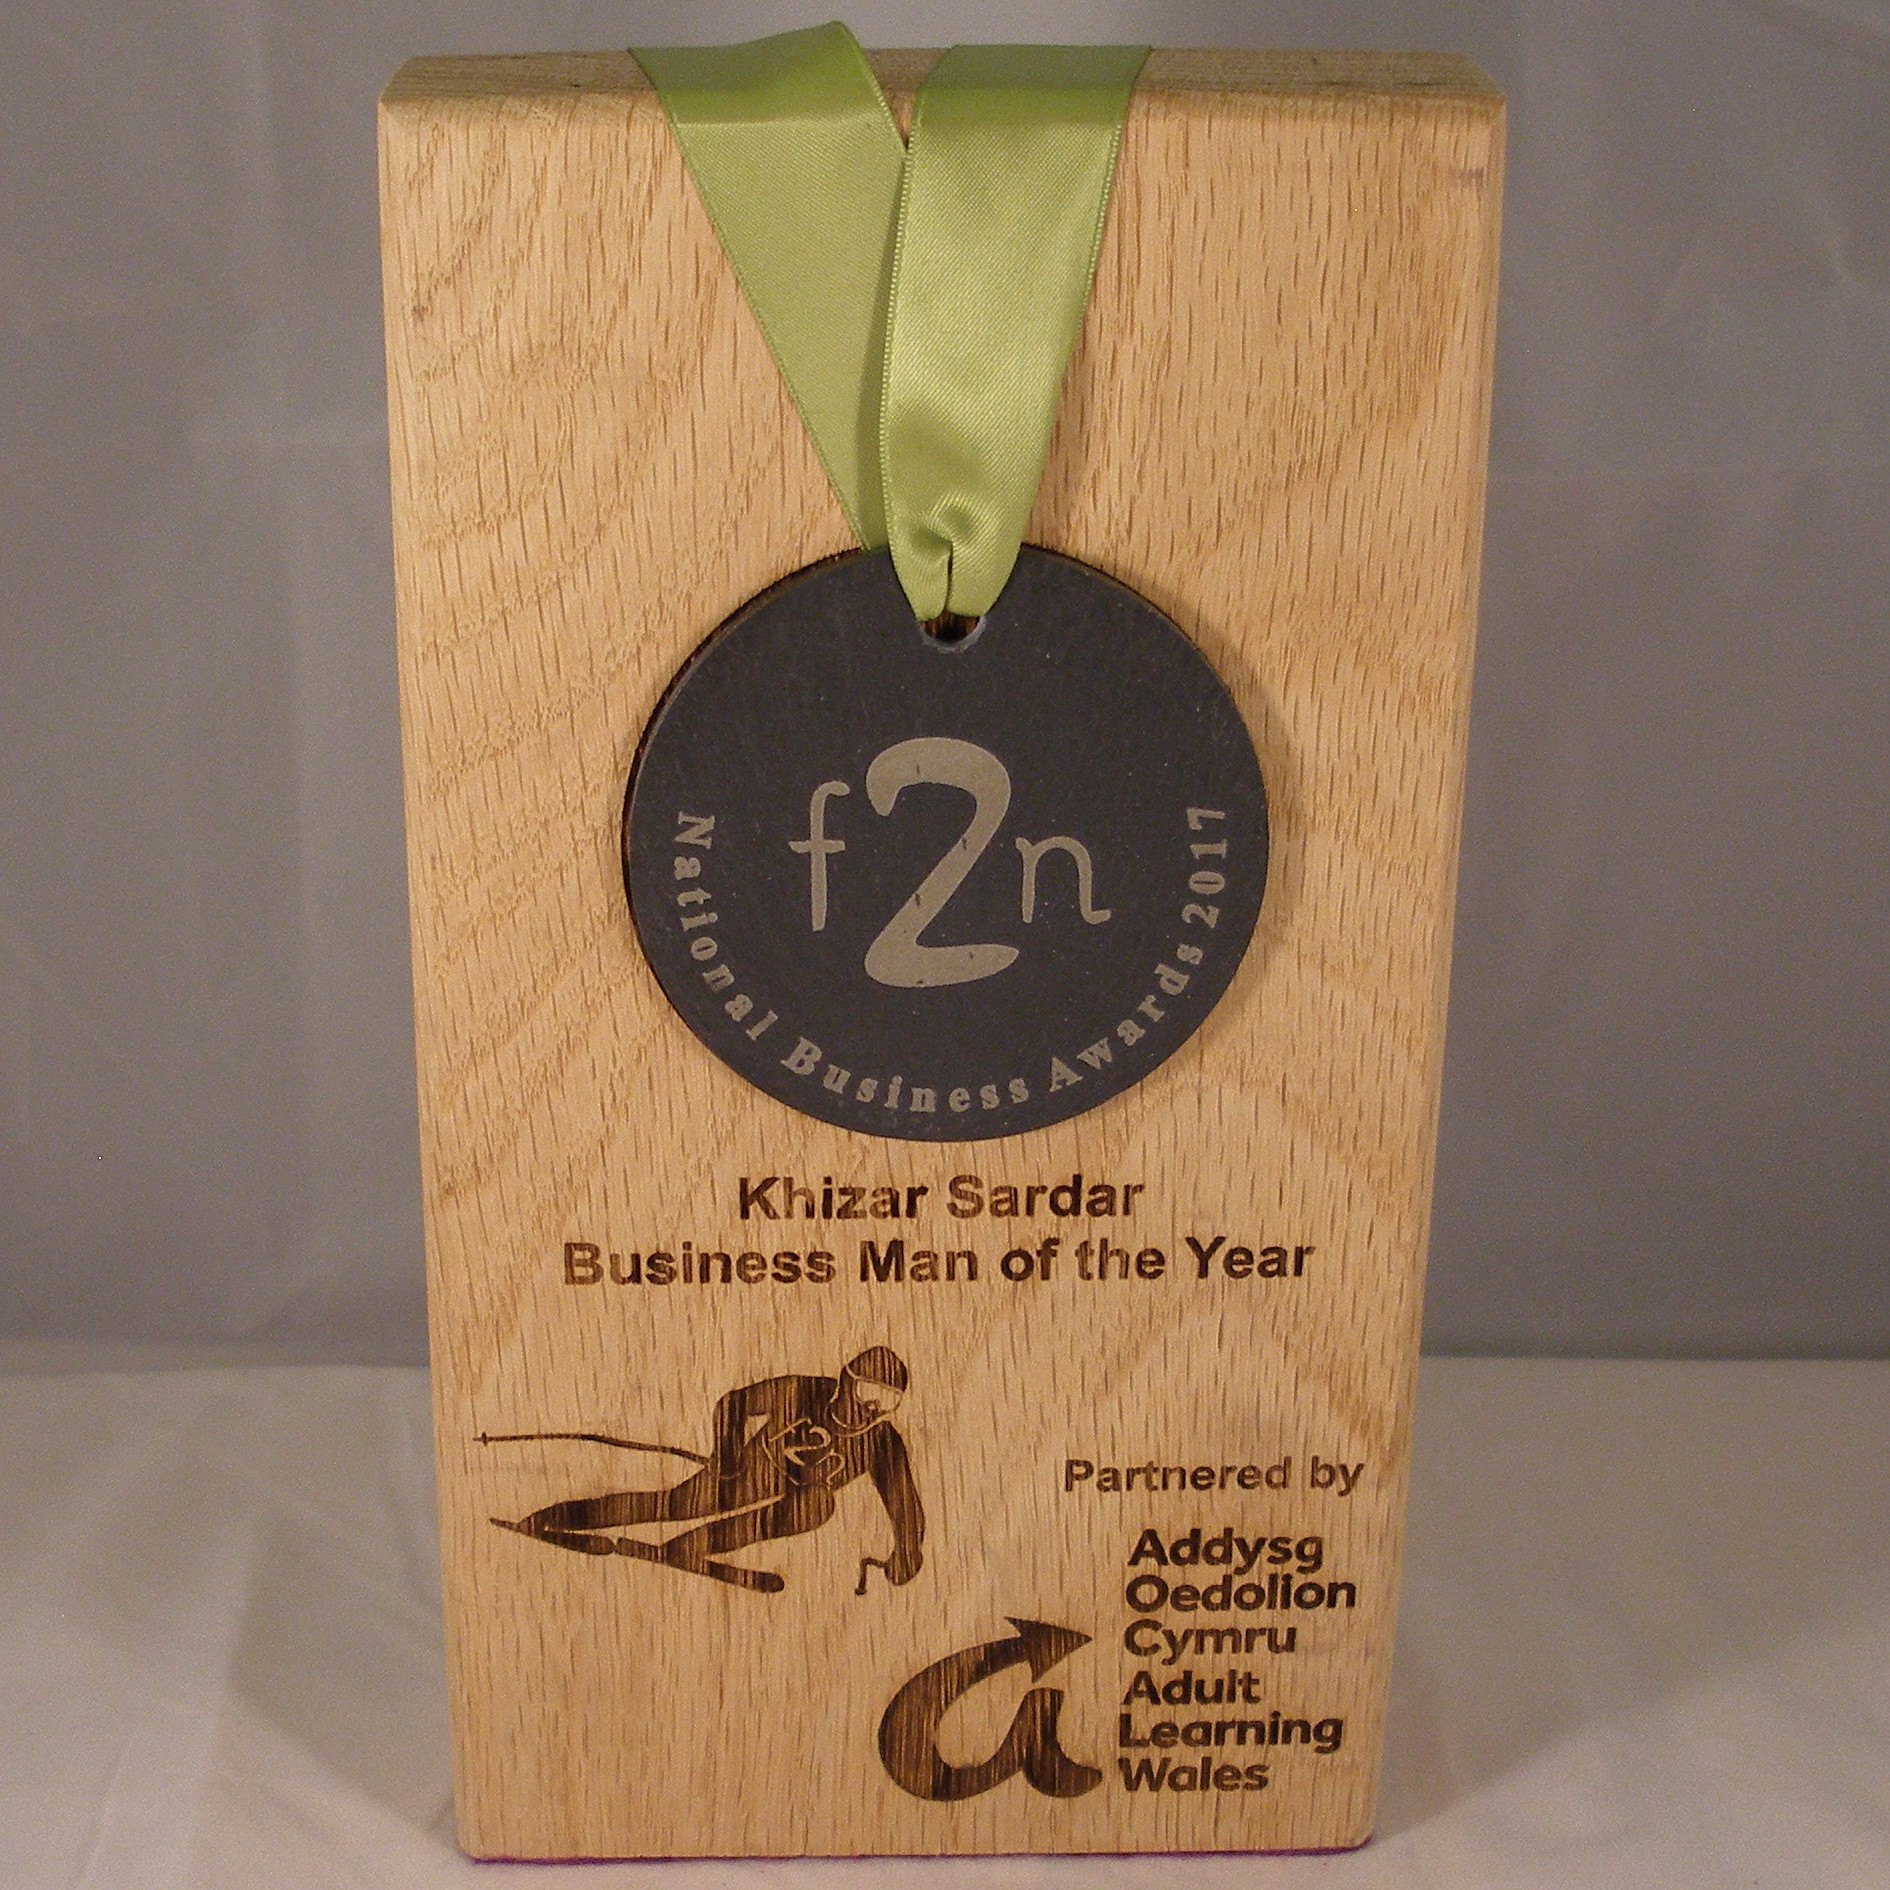 7) Khizar Sardar Business Man of the Year